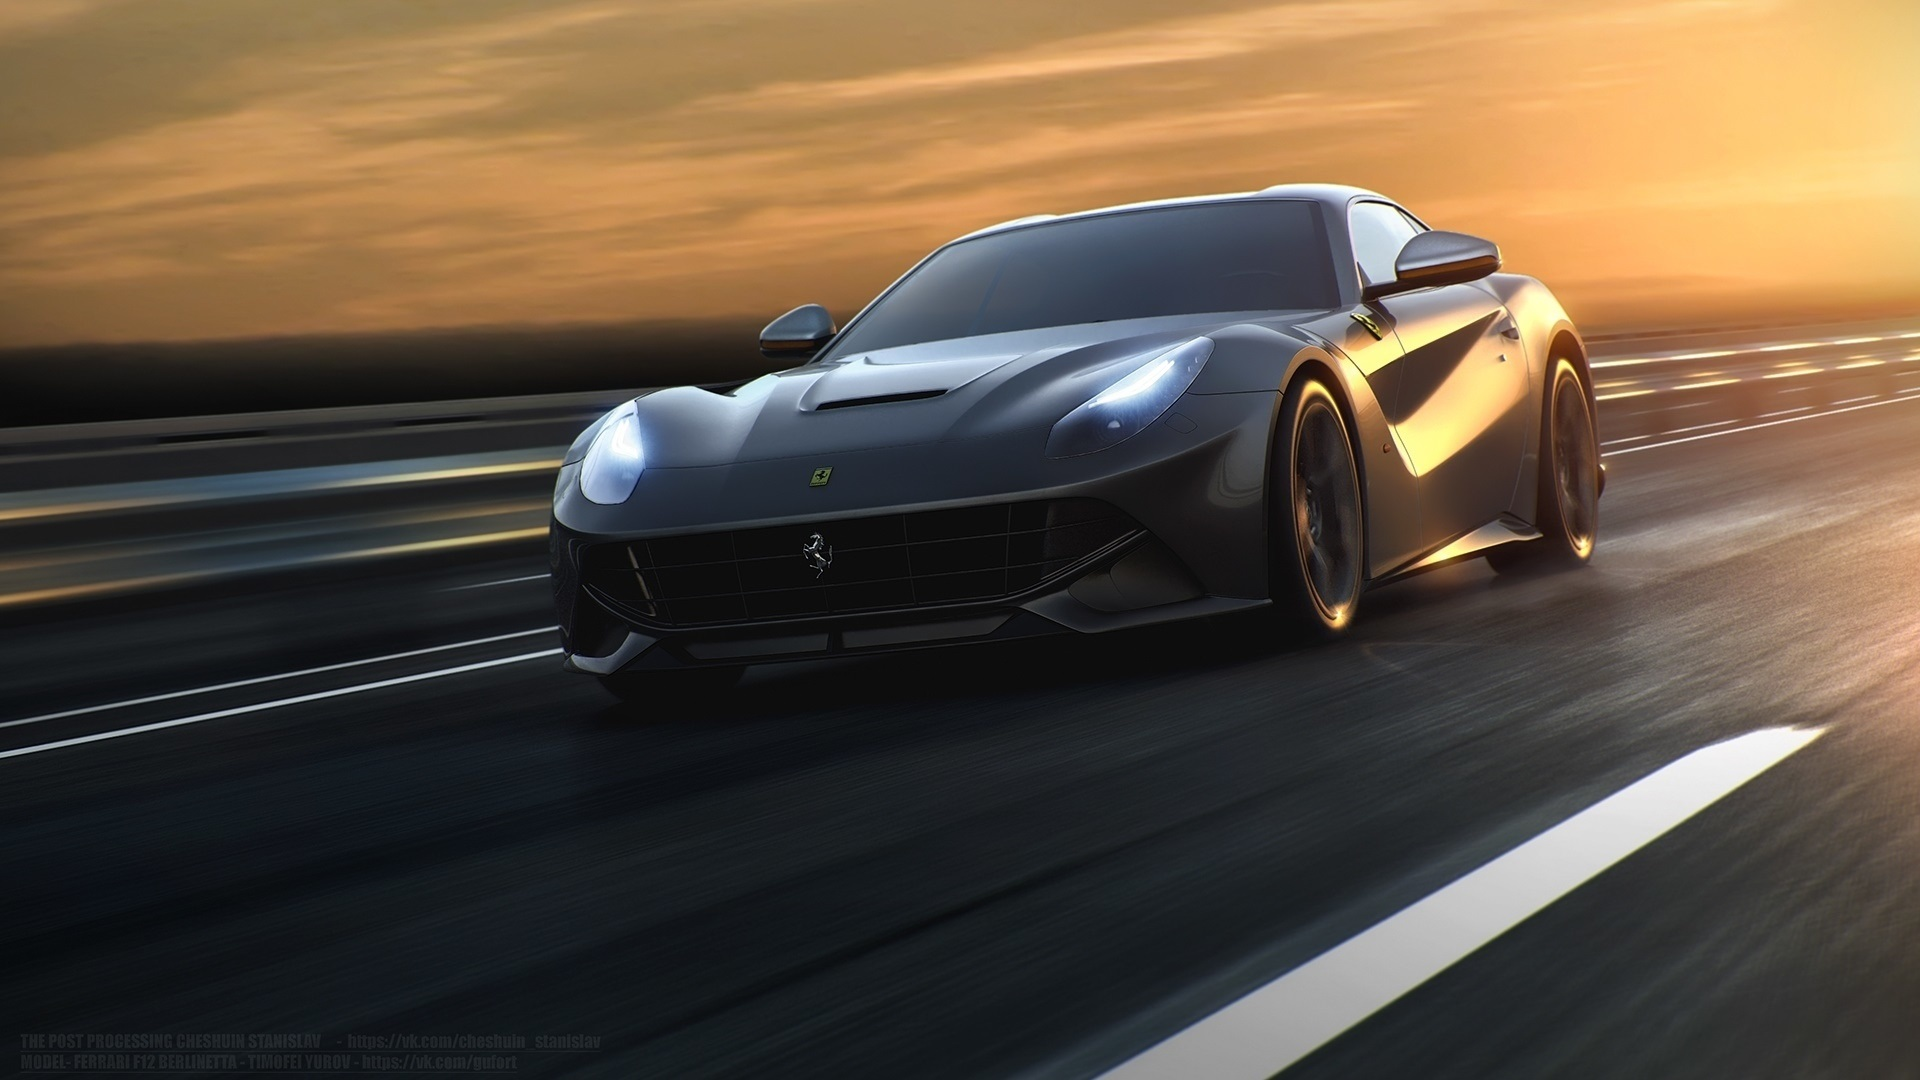 Wallpaper Ferrari F12 Black Supercar Speed Road Sunset 1920x1080